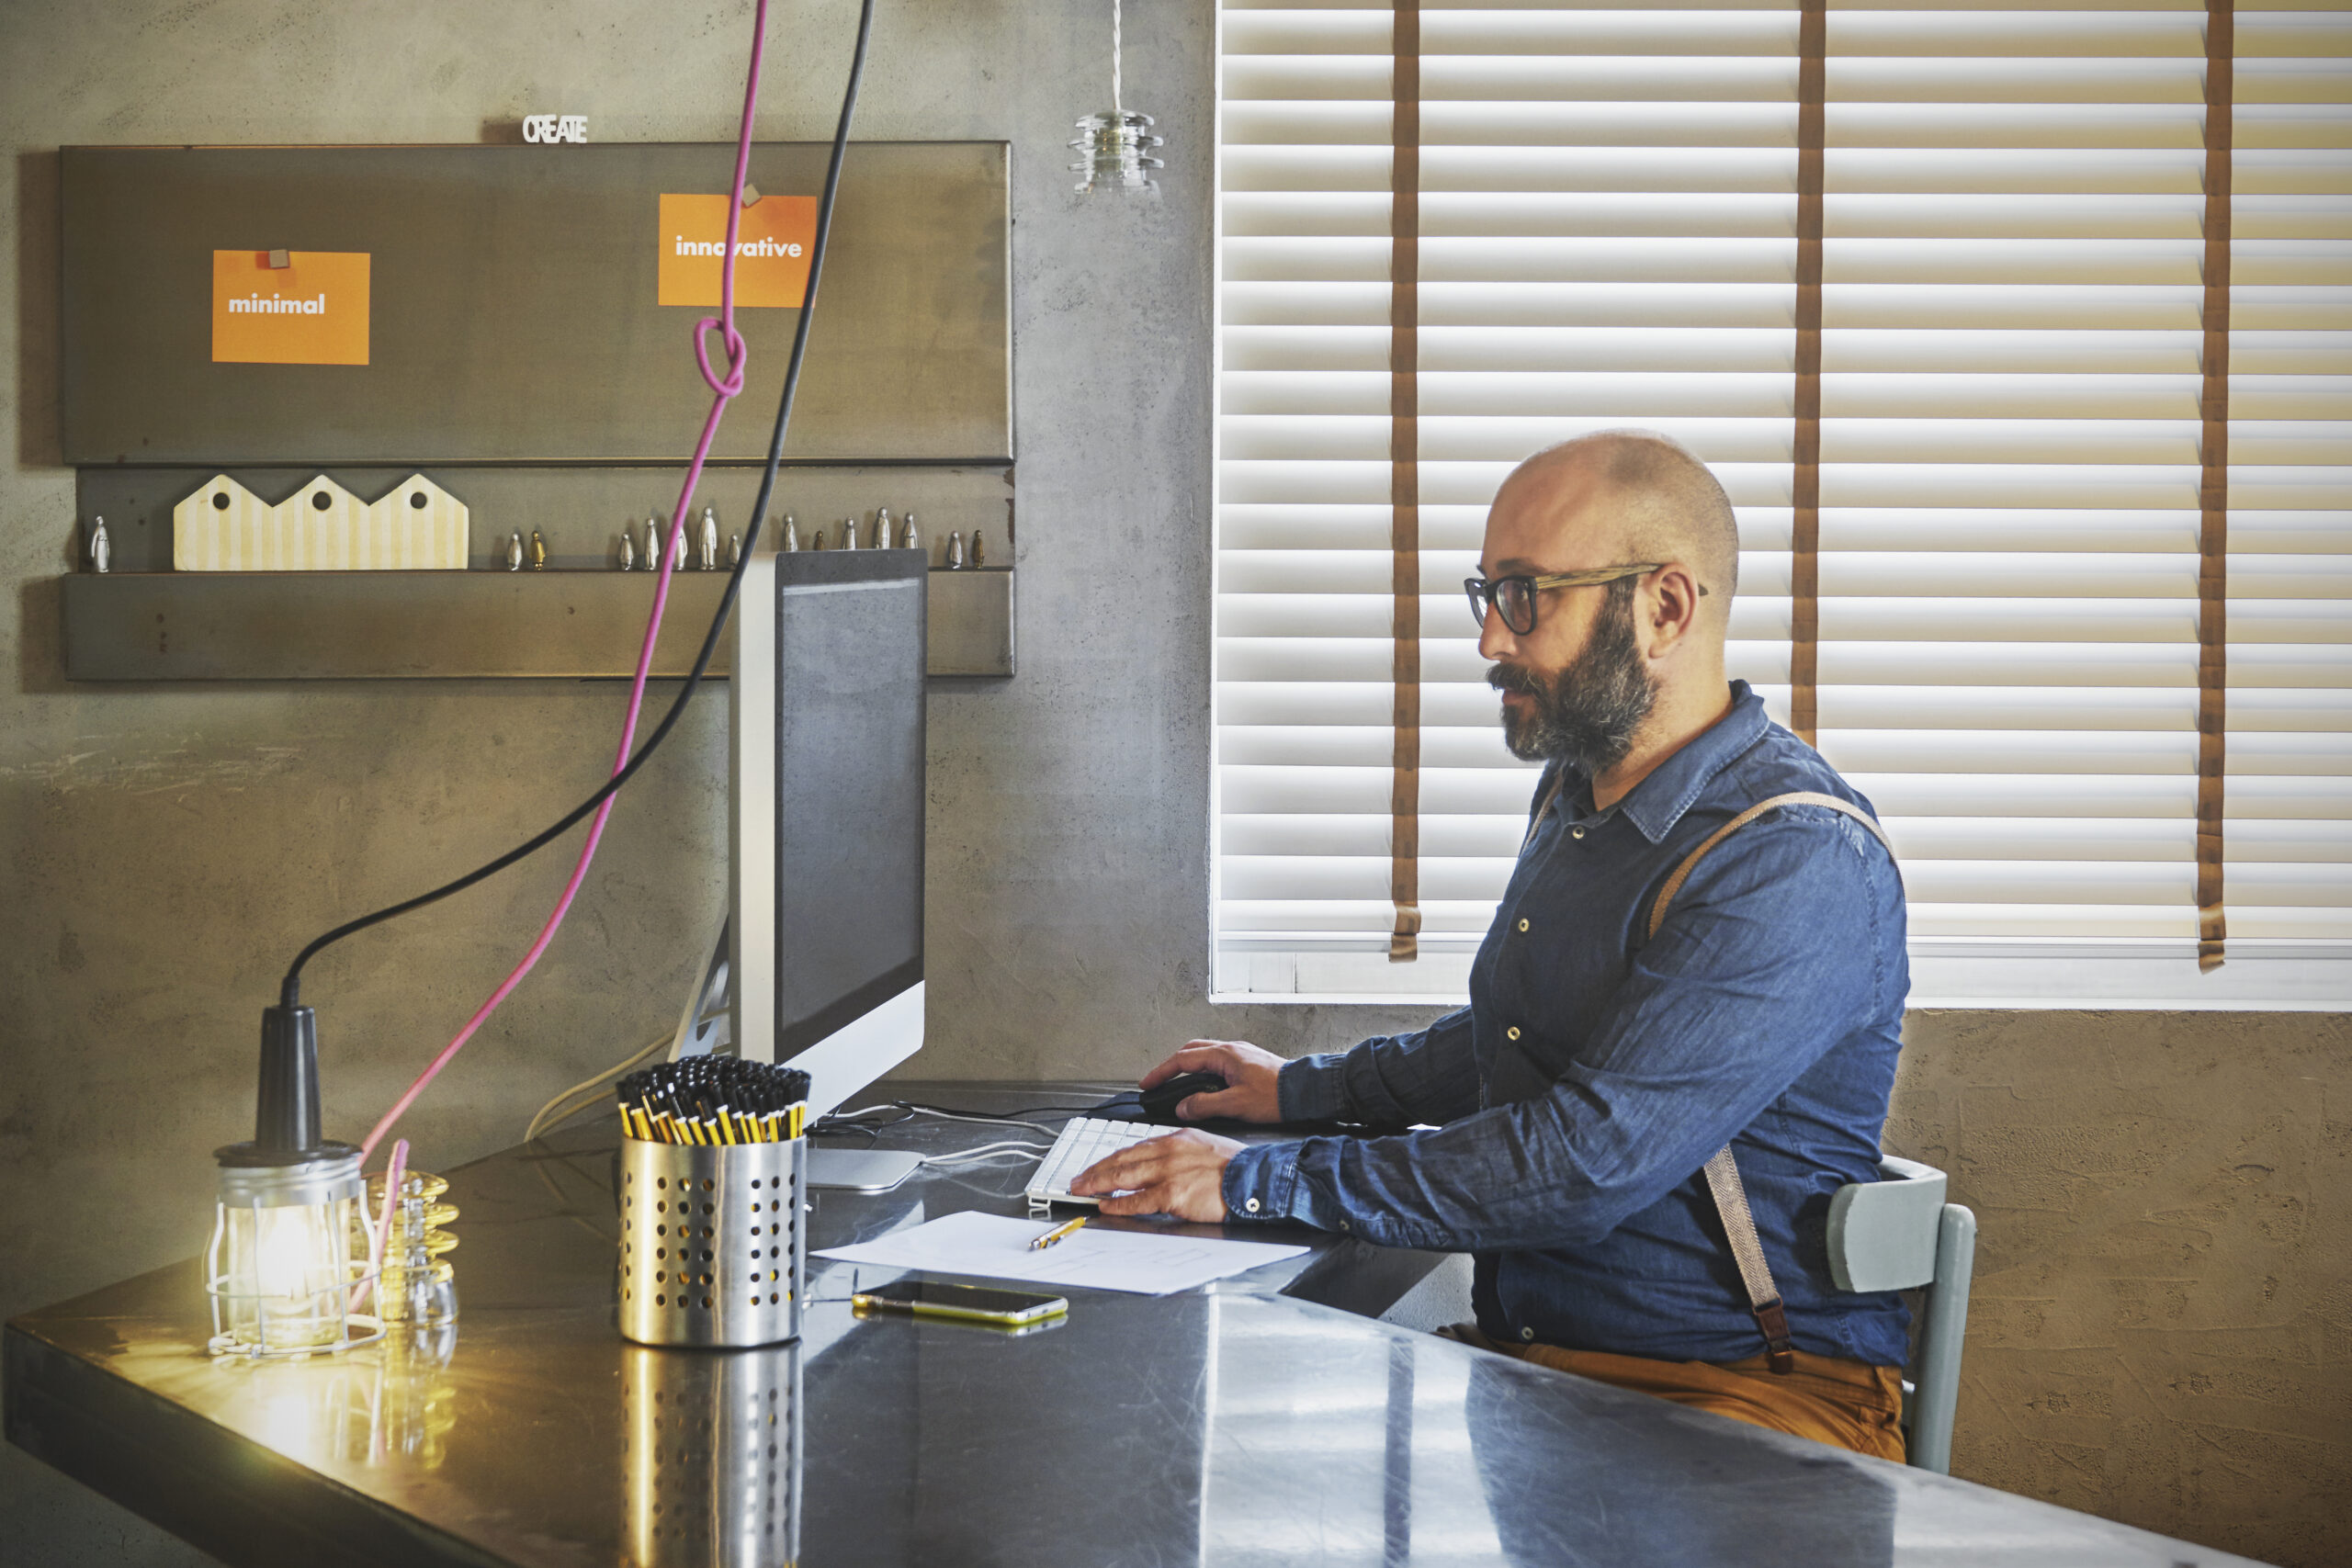 Man working online in office